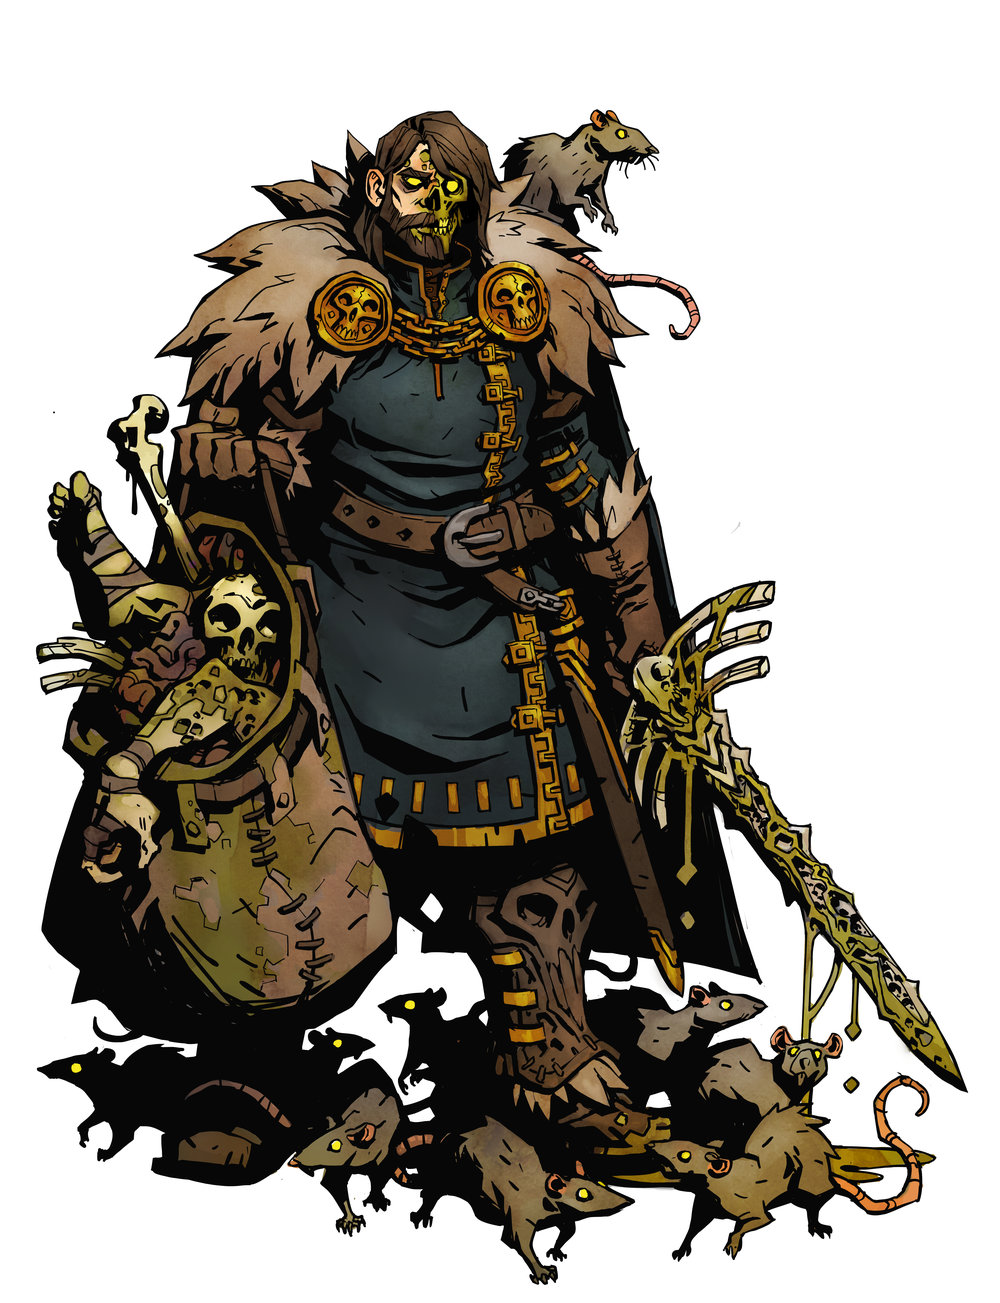 Plague_baron_final.jpg